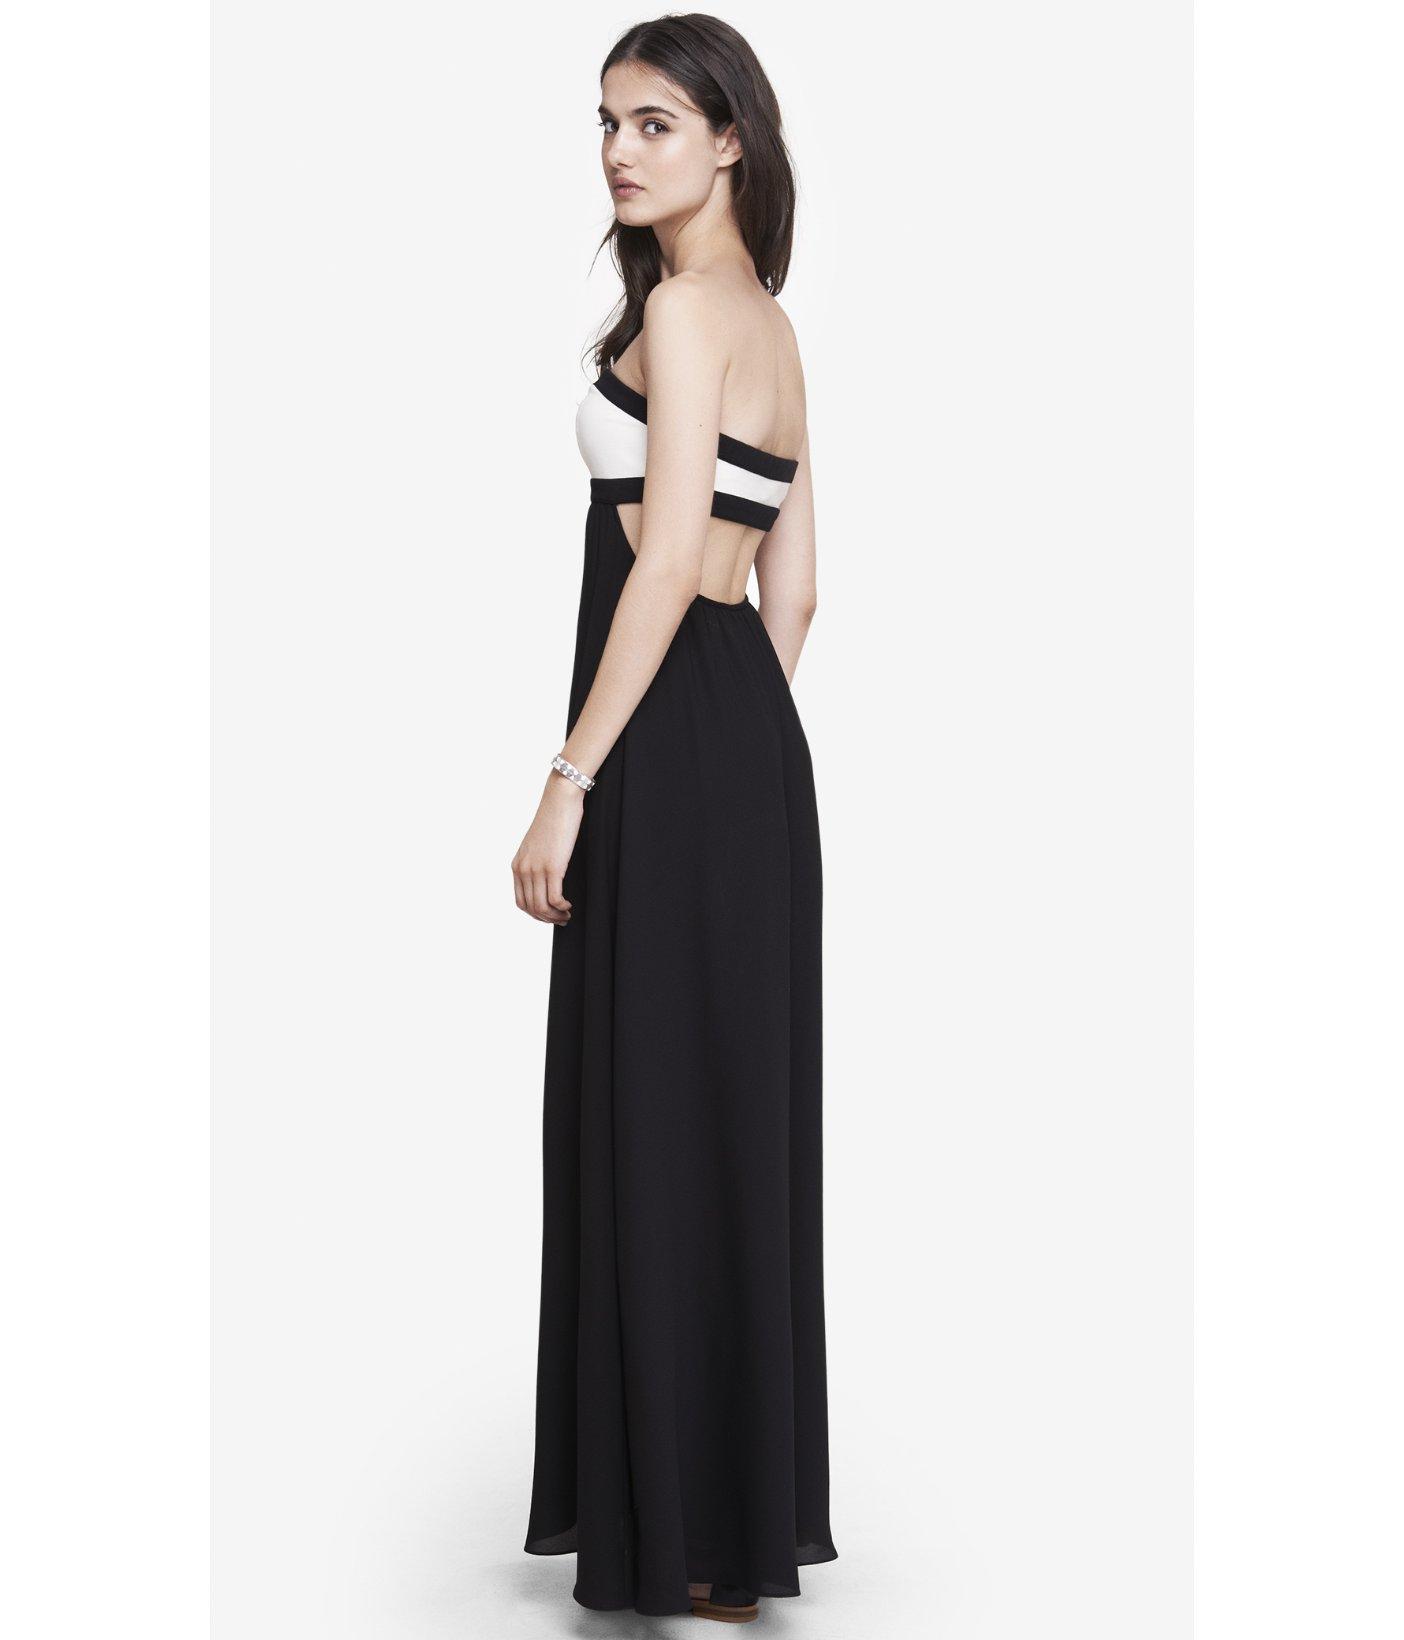 Express Open Back Color Block Maxi Dress in Black - Lyst